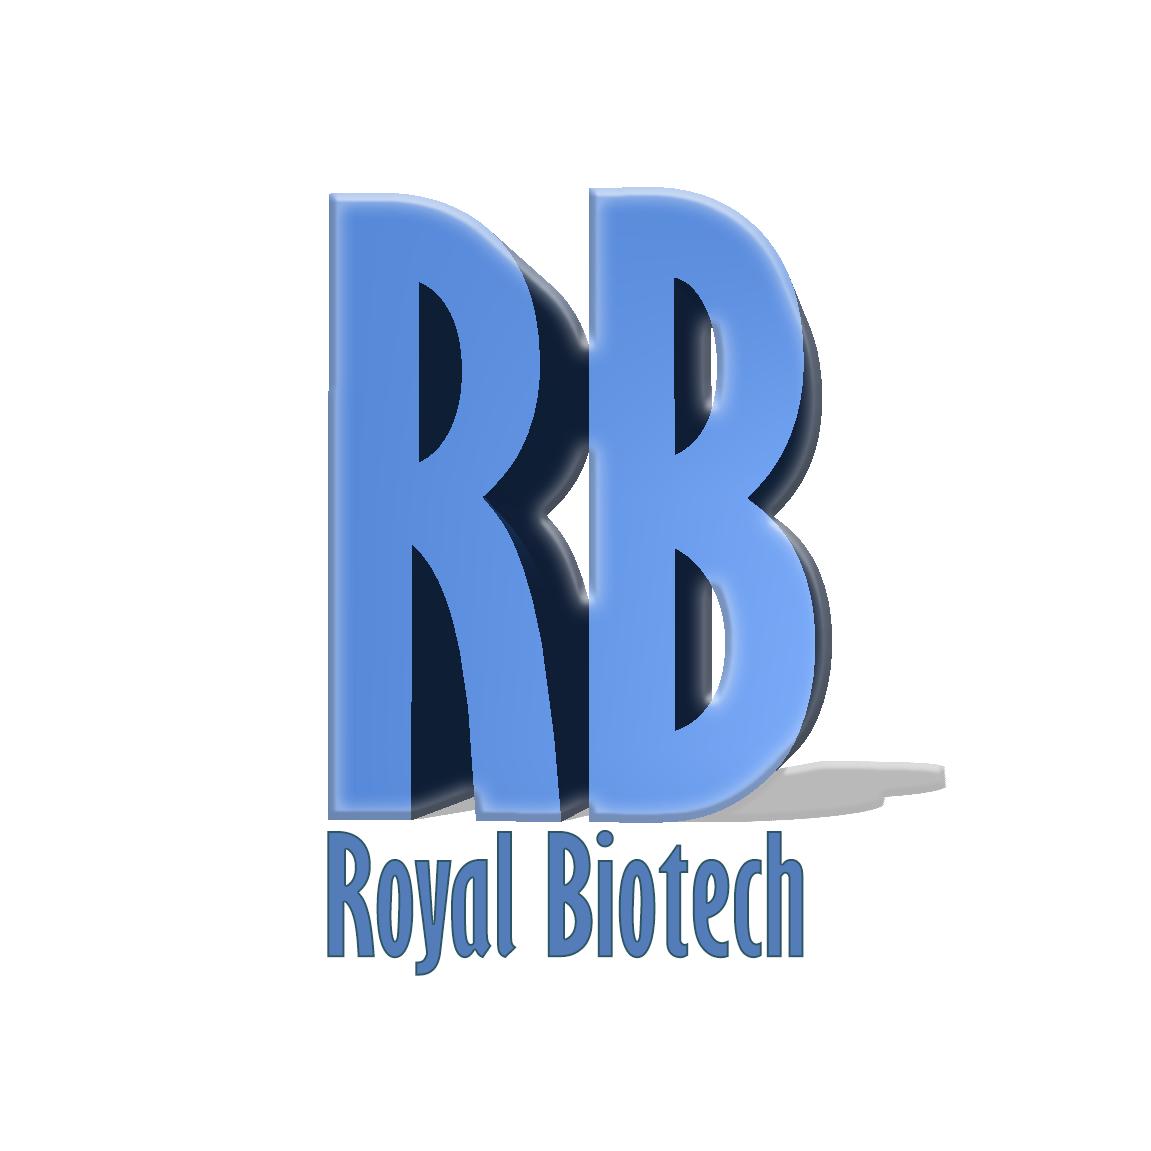 Royal Biotech Inc